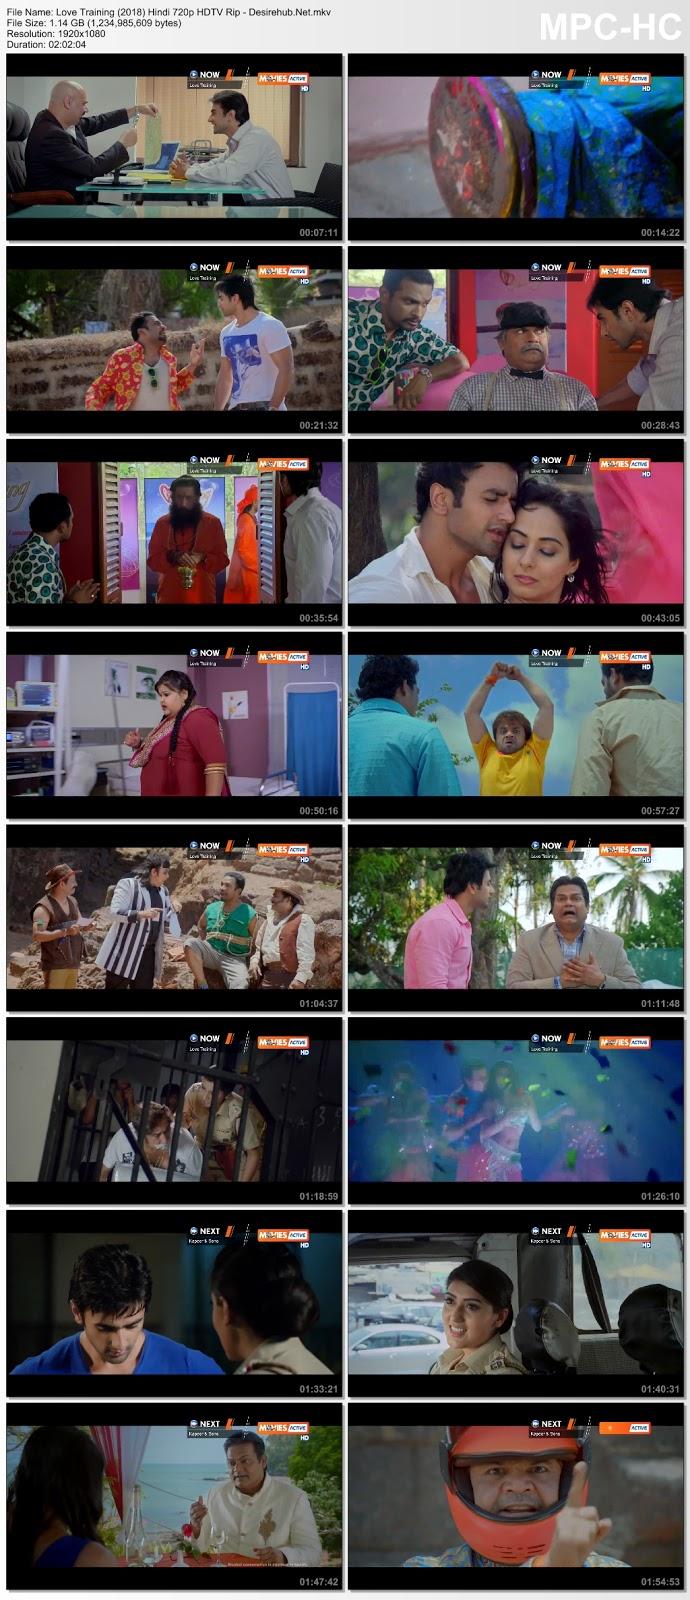 Love Training (2018) Hindi 720p HDTVRip 1GB Desirehub